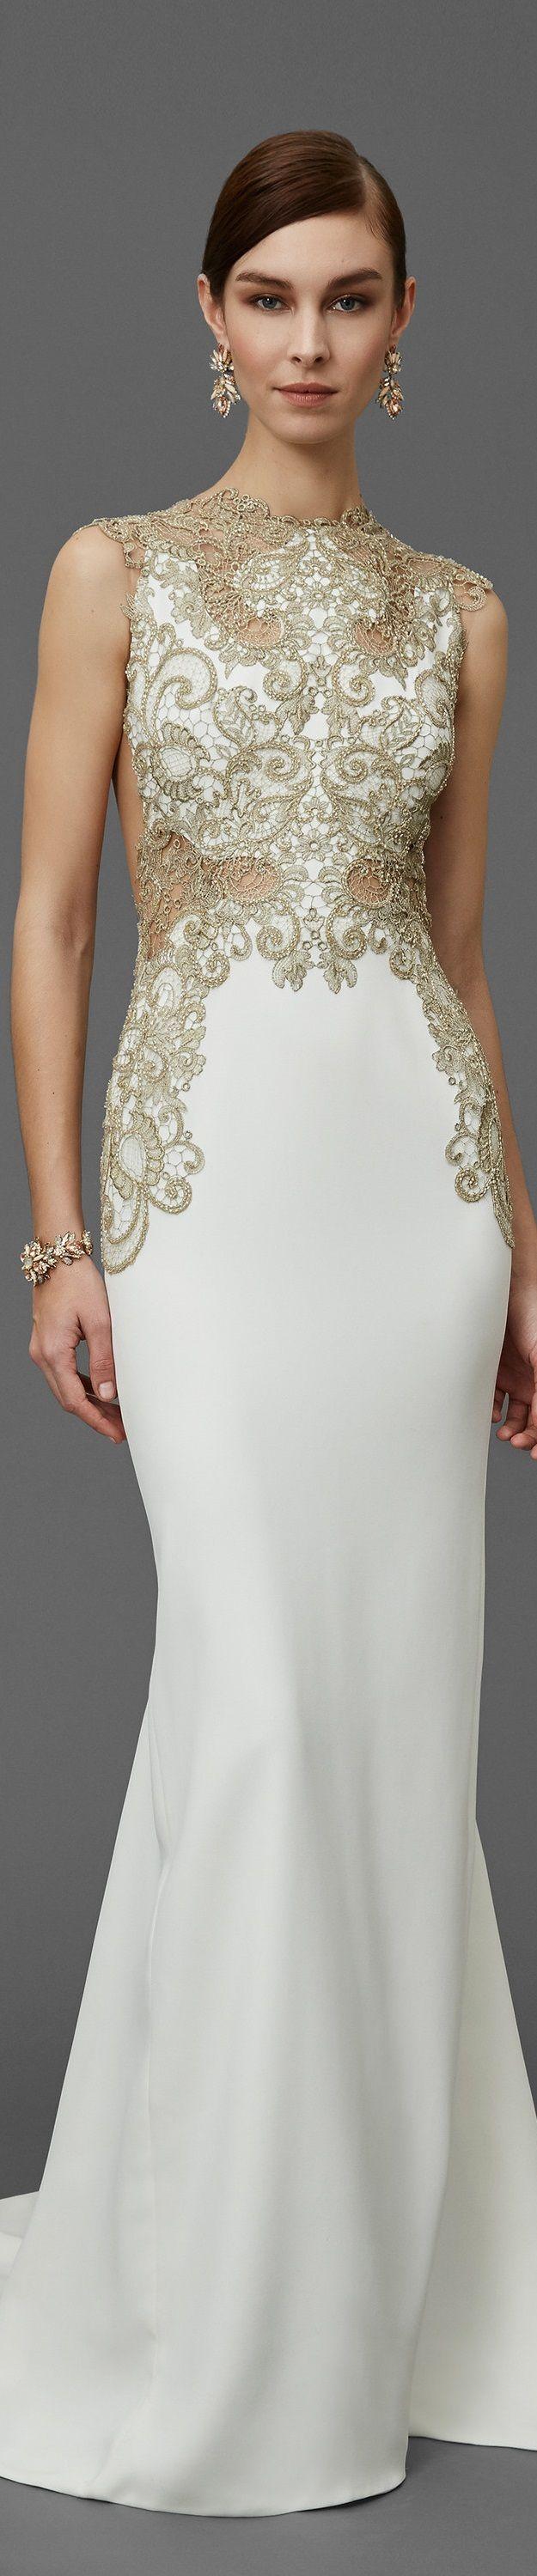 best dresses images on pinterest cute dresses evening gowns